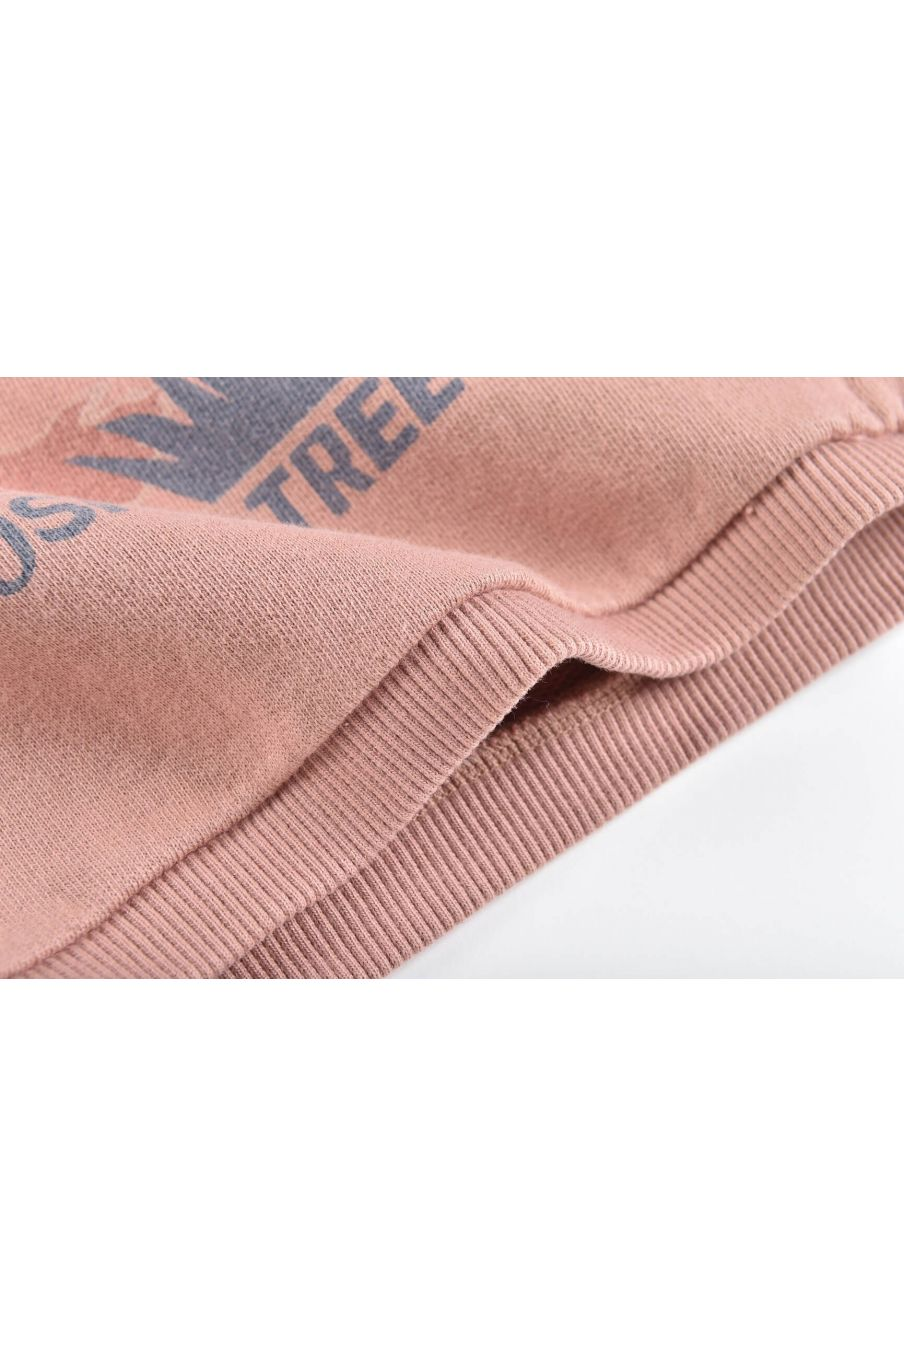 bohemian chic vintage sweatshirt boy afalo dusty pink